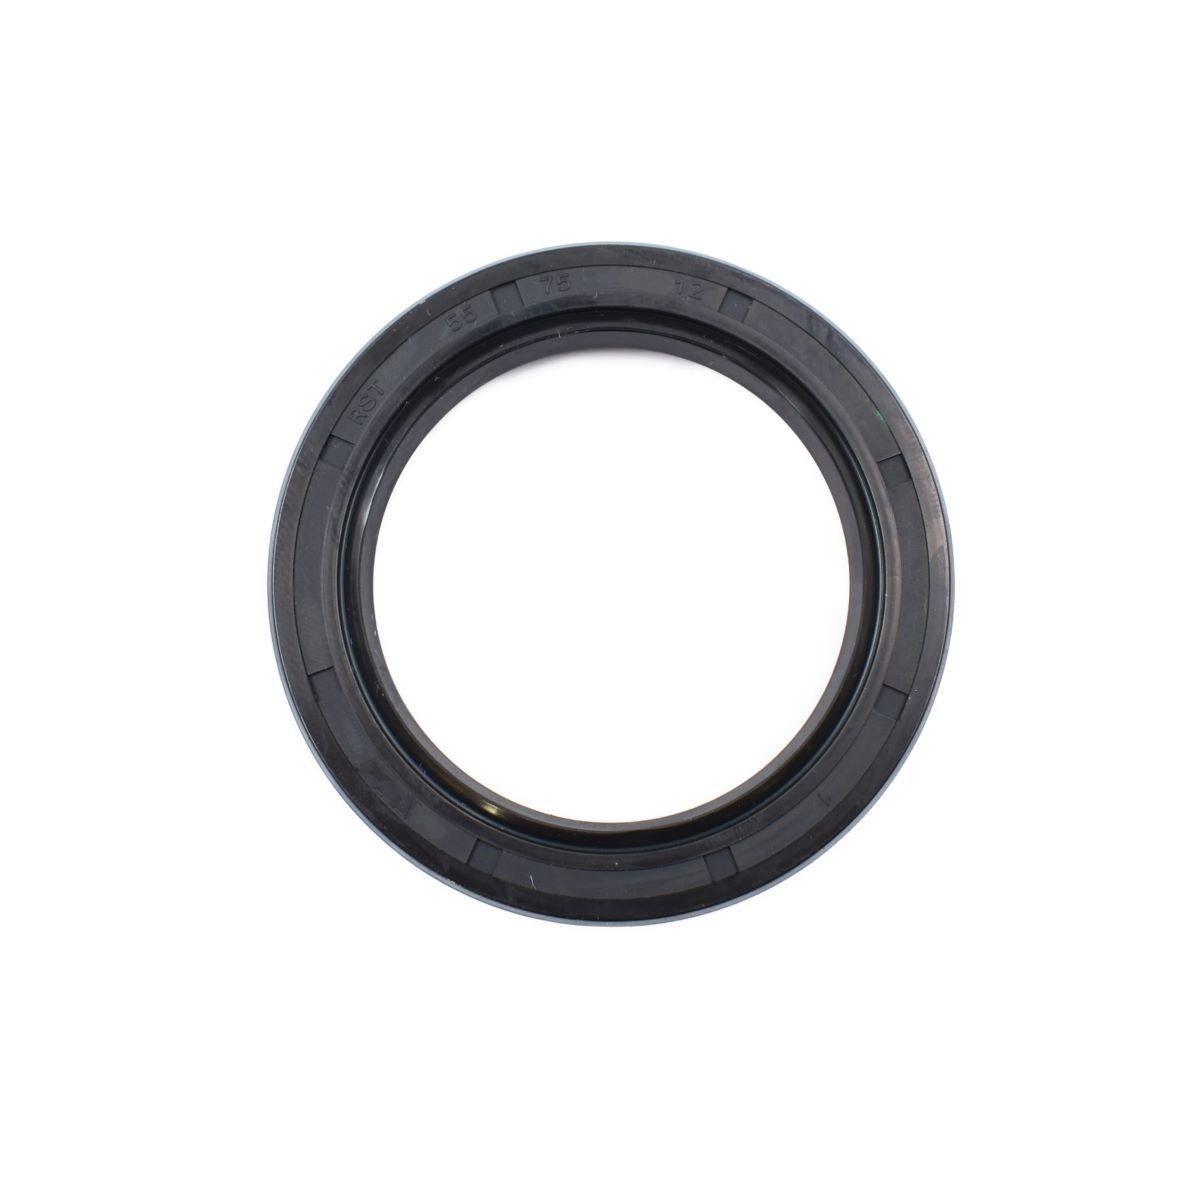 Keerring steekas achterbrug Yanmar Minitractor Afmetingen: 55x75x12 mm